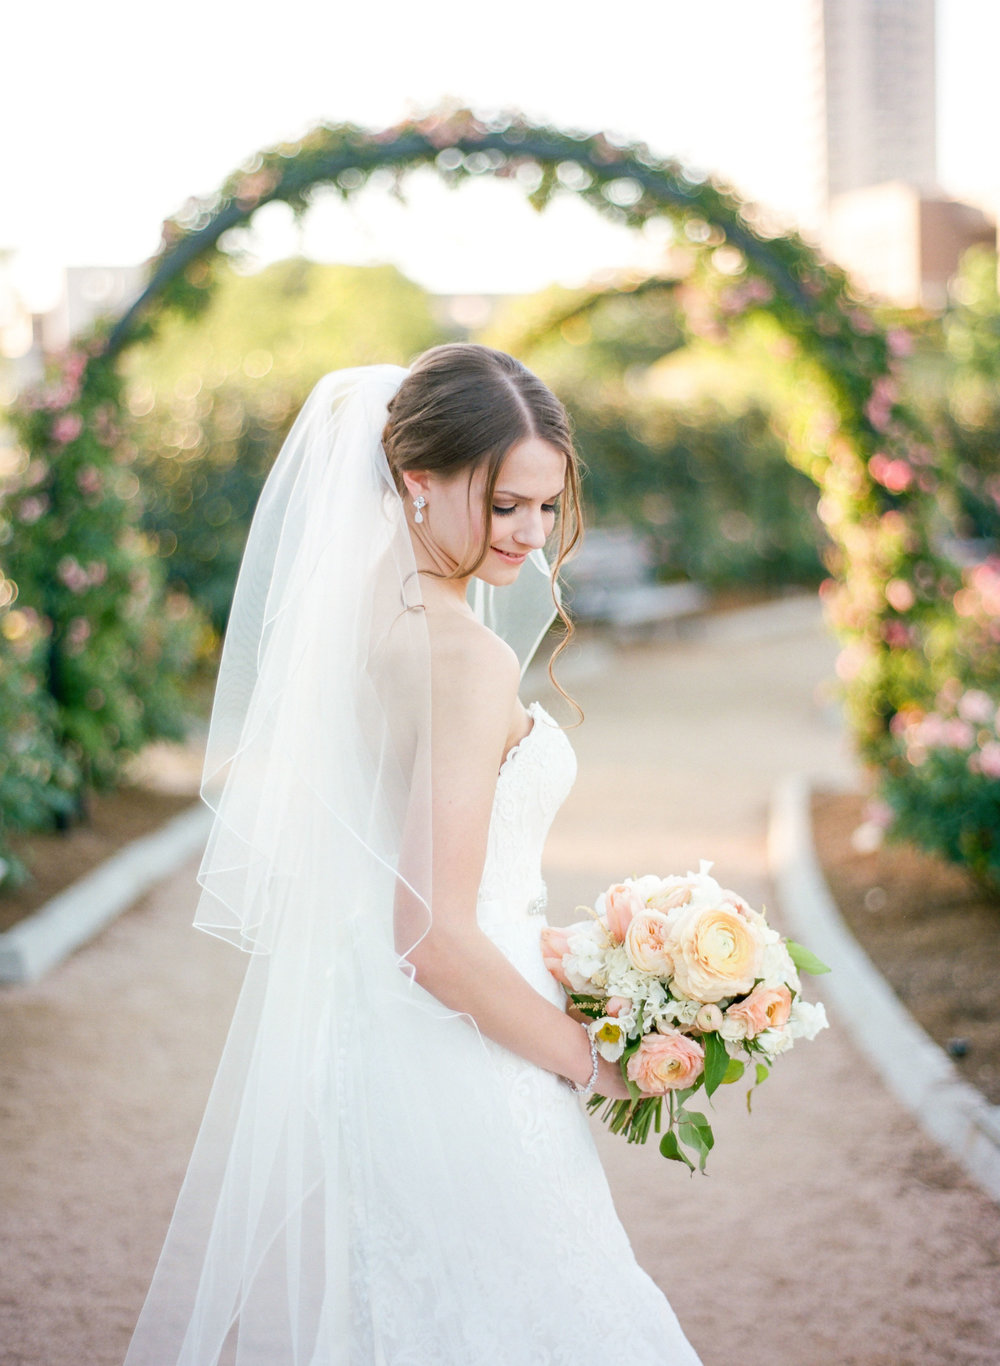 Houston-Wedding-Photographer-Film-Fine-Art-Bridals-Dana+Fernandez-Photography-13.jpg